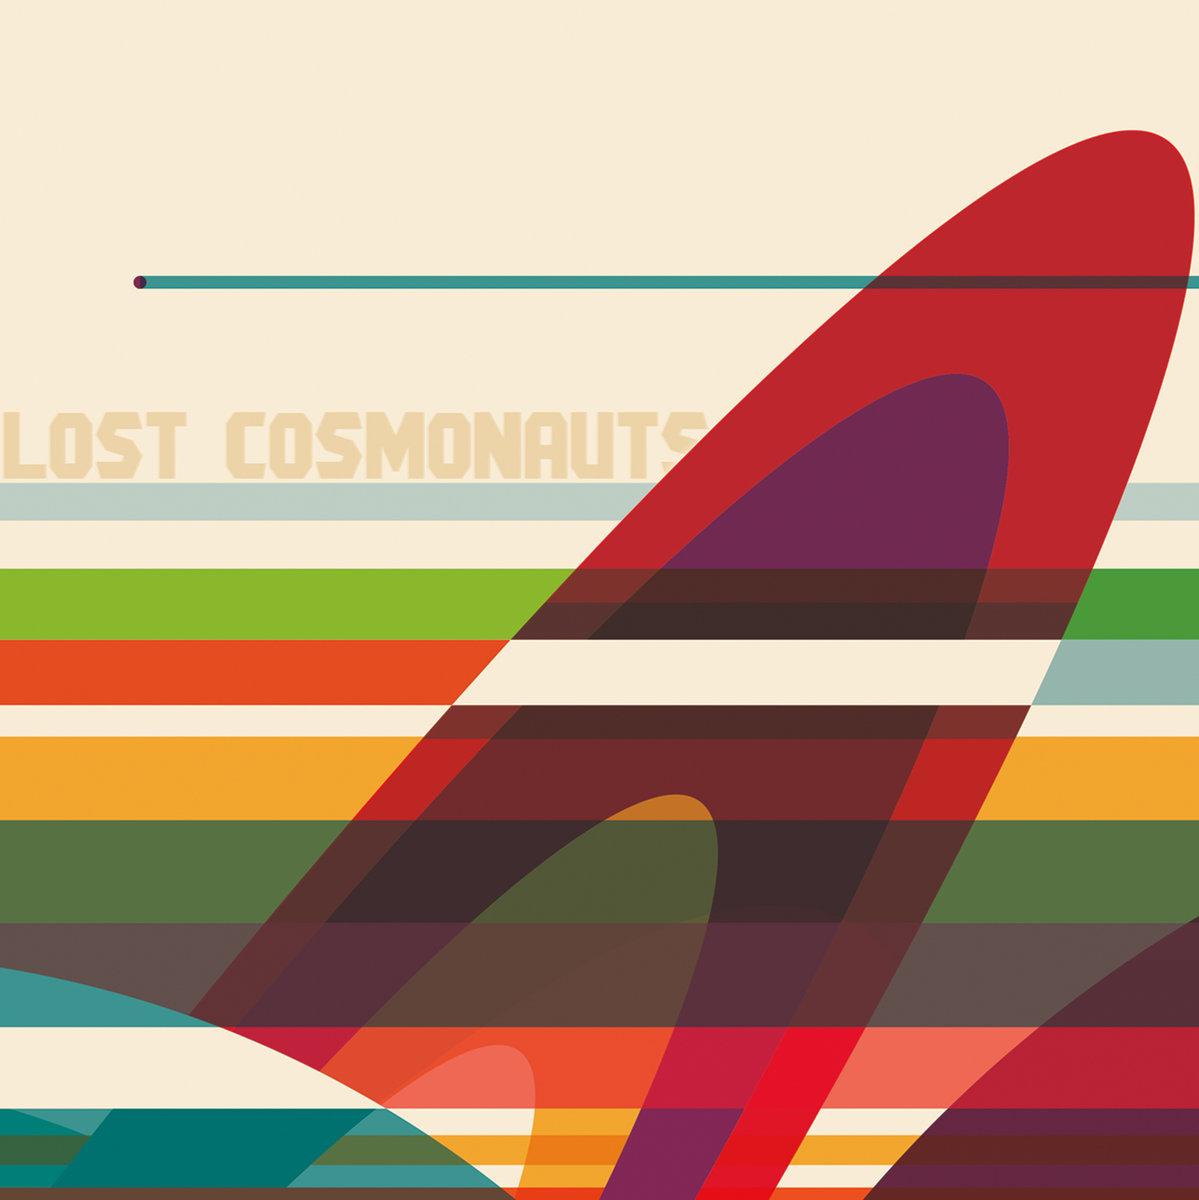 Lost Cosmonauts – Lost Cosmonauts